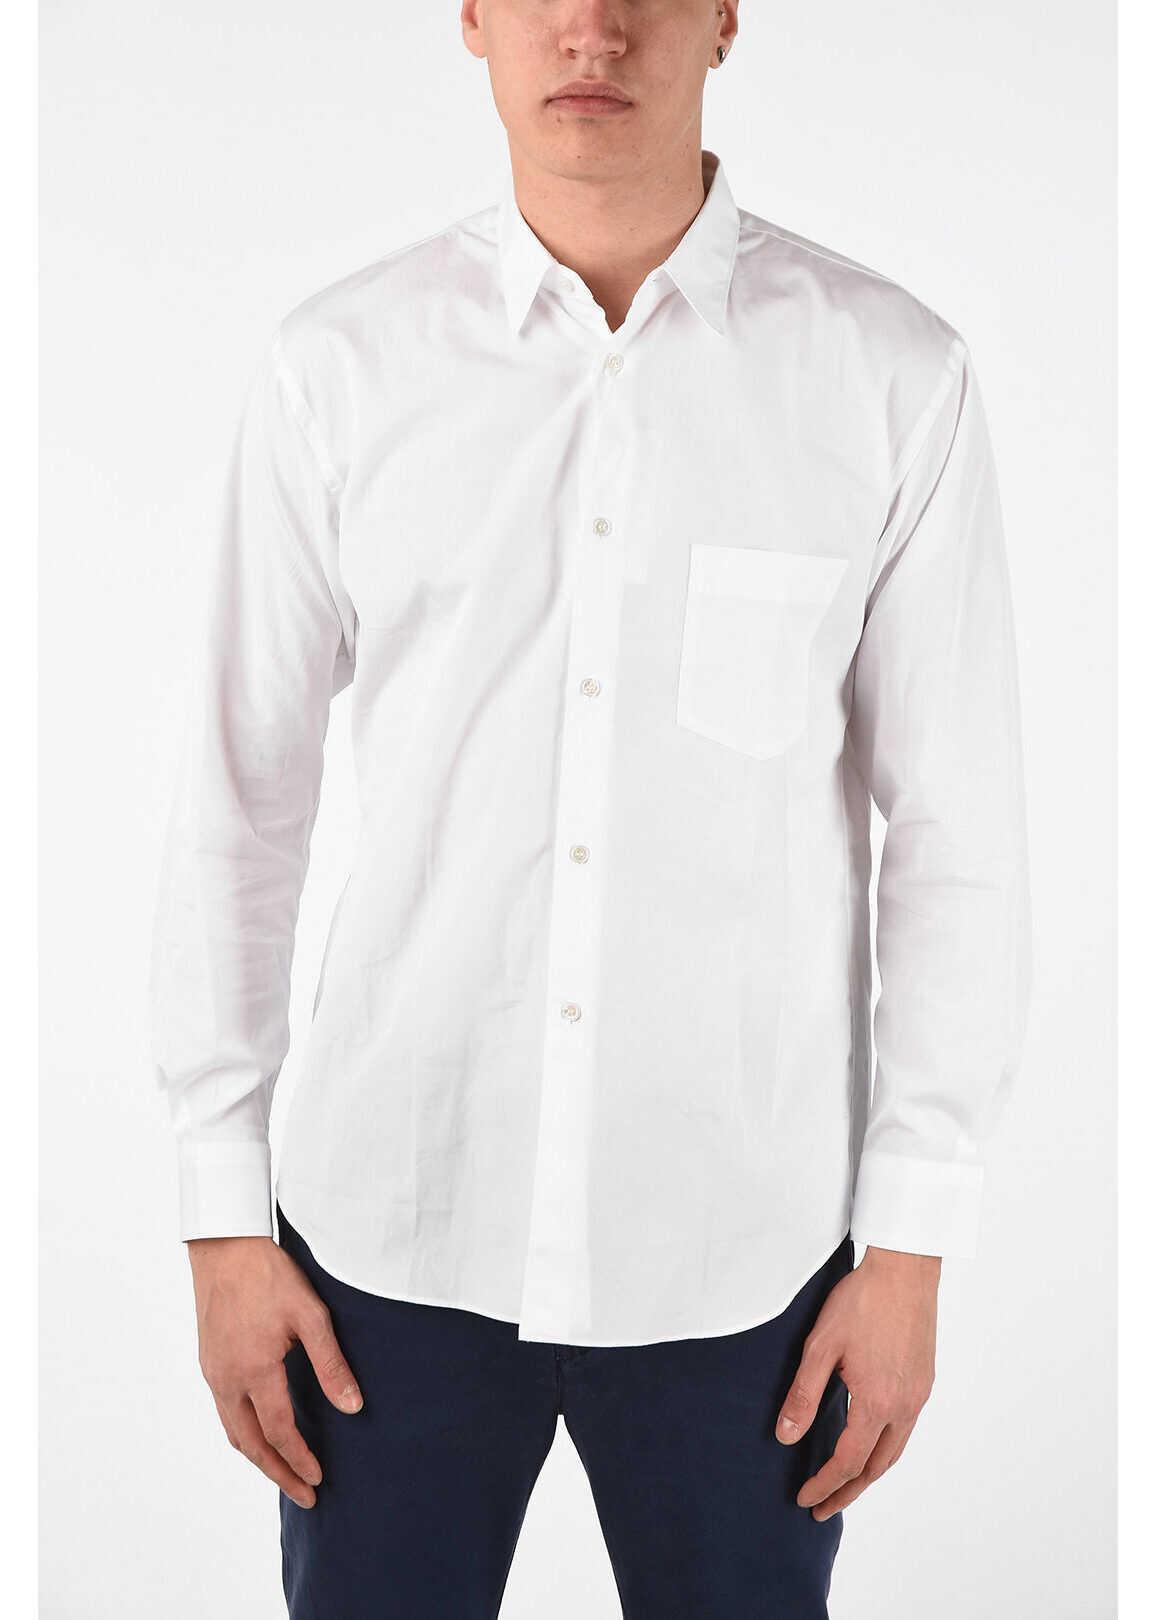 Comme des Garçons FOREVER Cotton Classic Collar Shirt with Pocket WHITE imagine